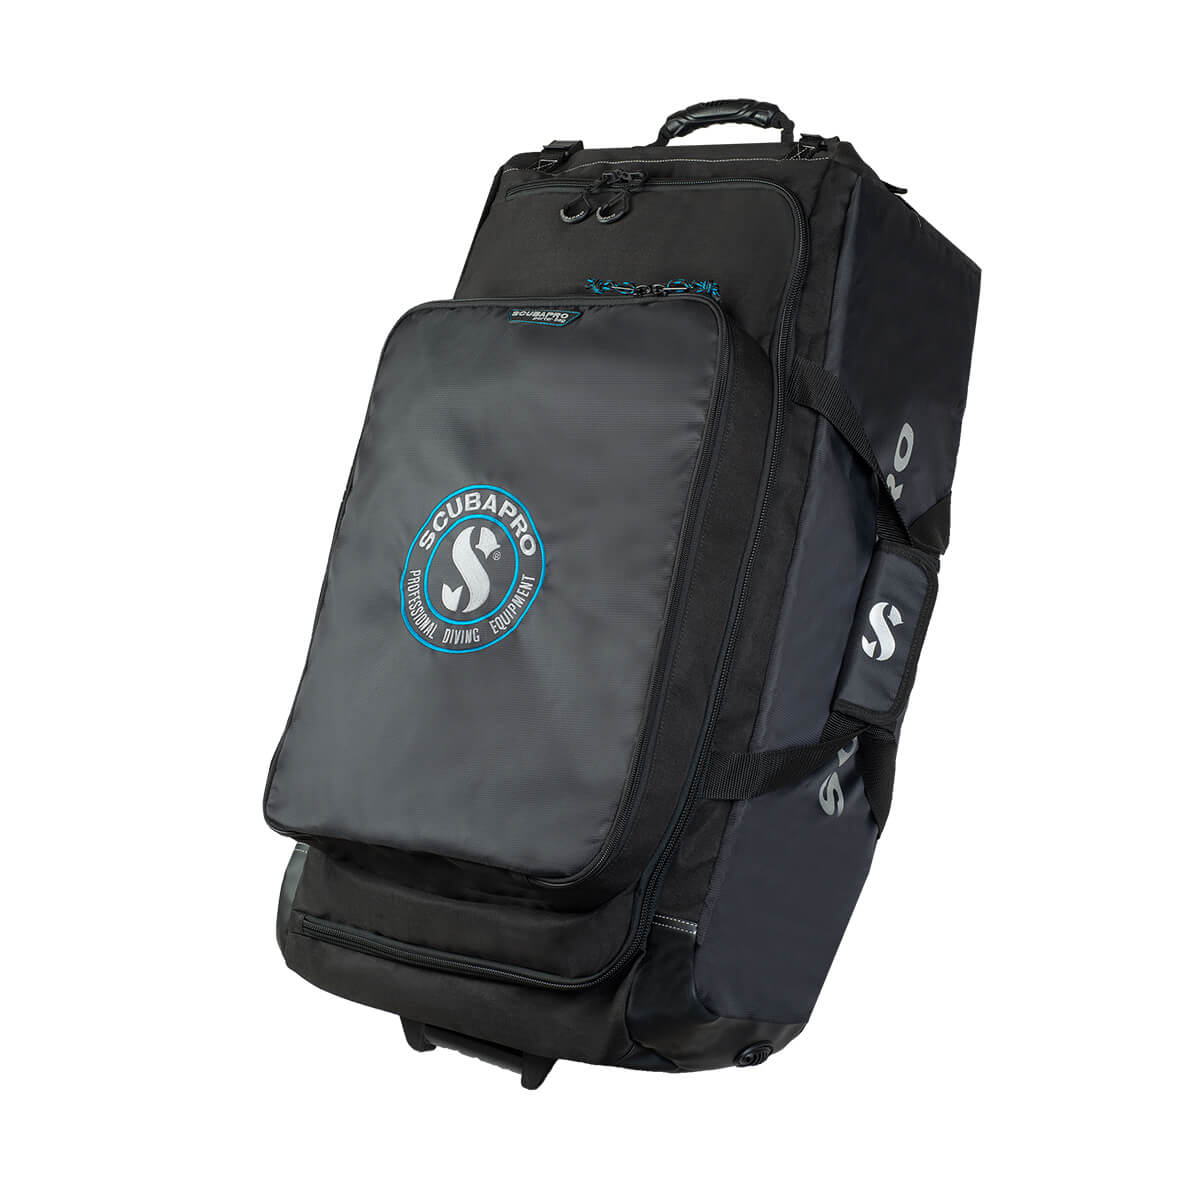 SCUBAPRO - Porter Bag Trolley